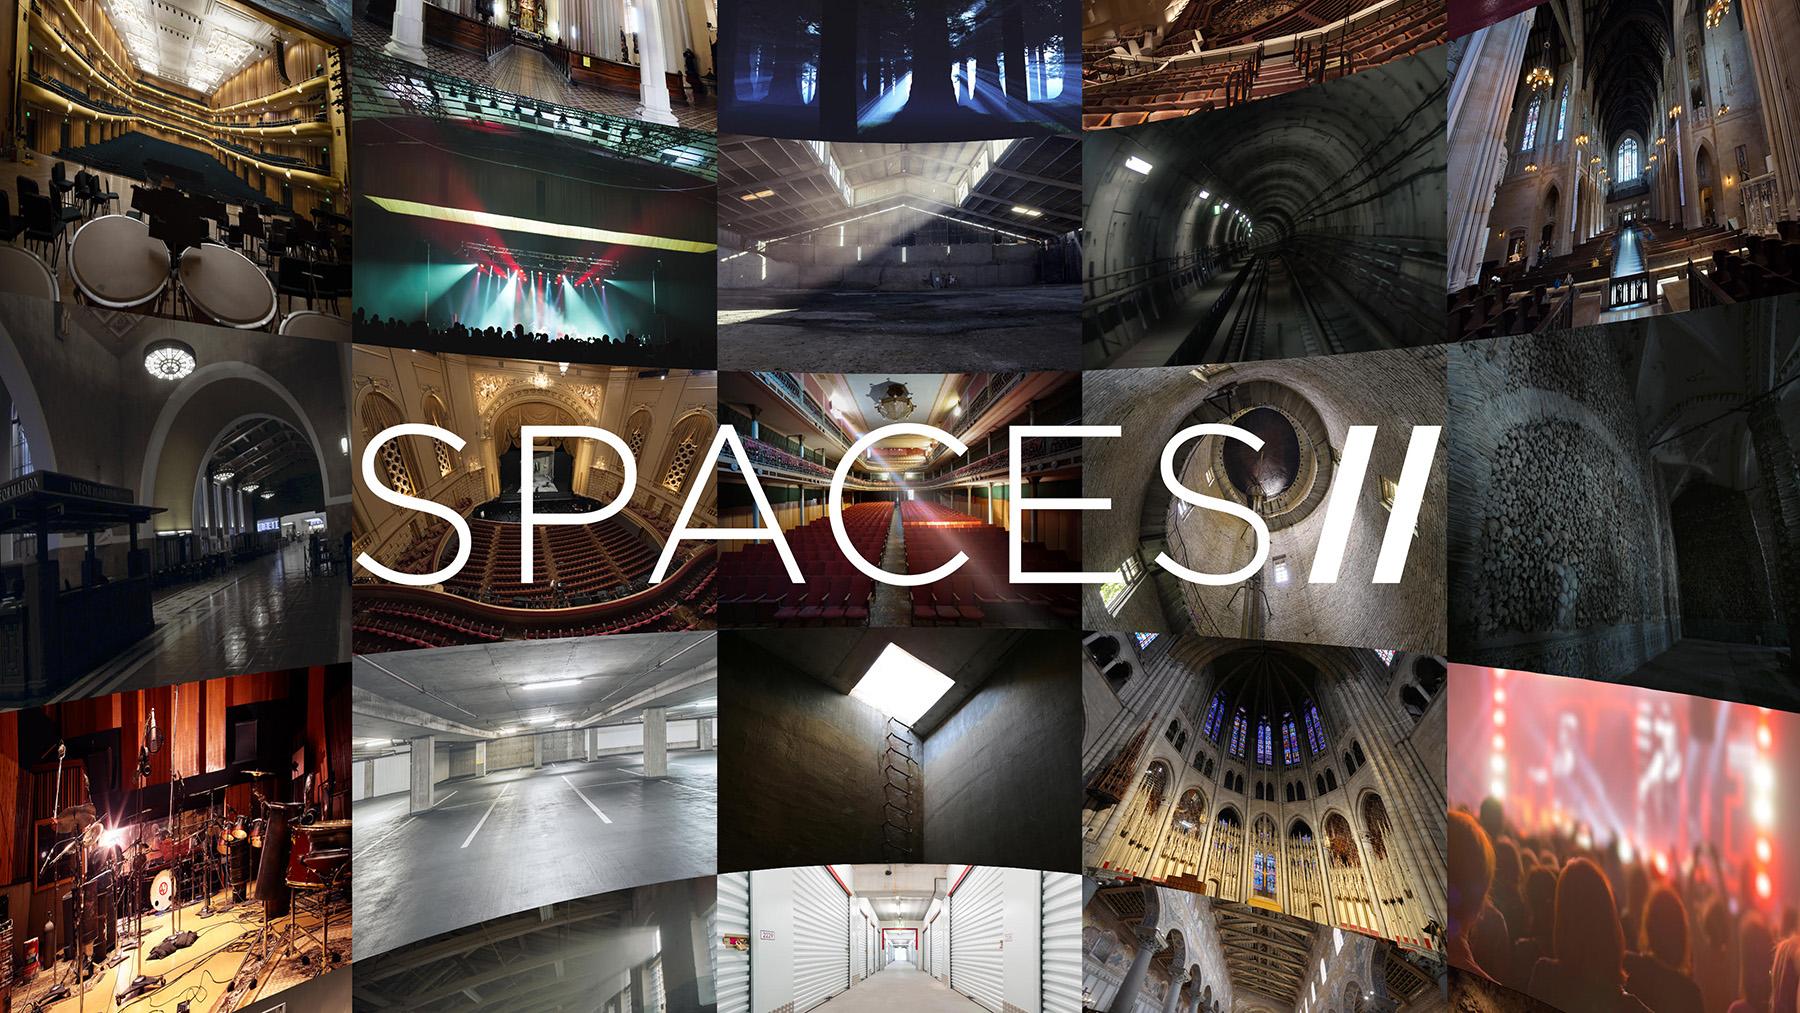 News: EastWest bringt Faltungshall Spaces II heraus